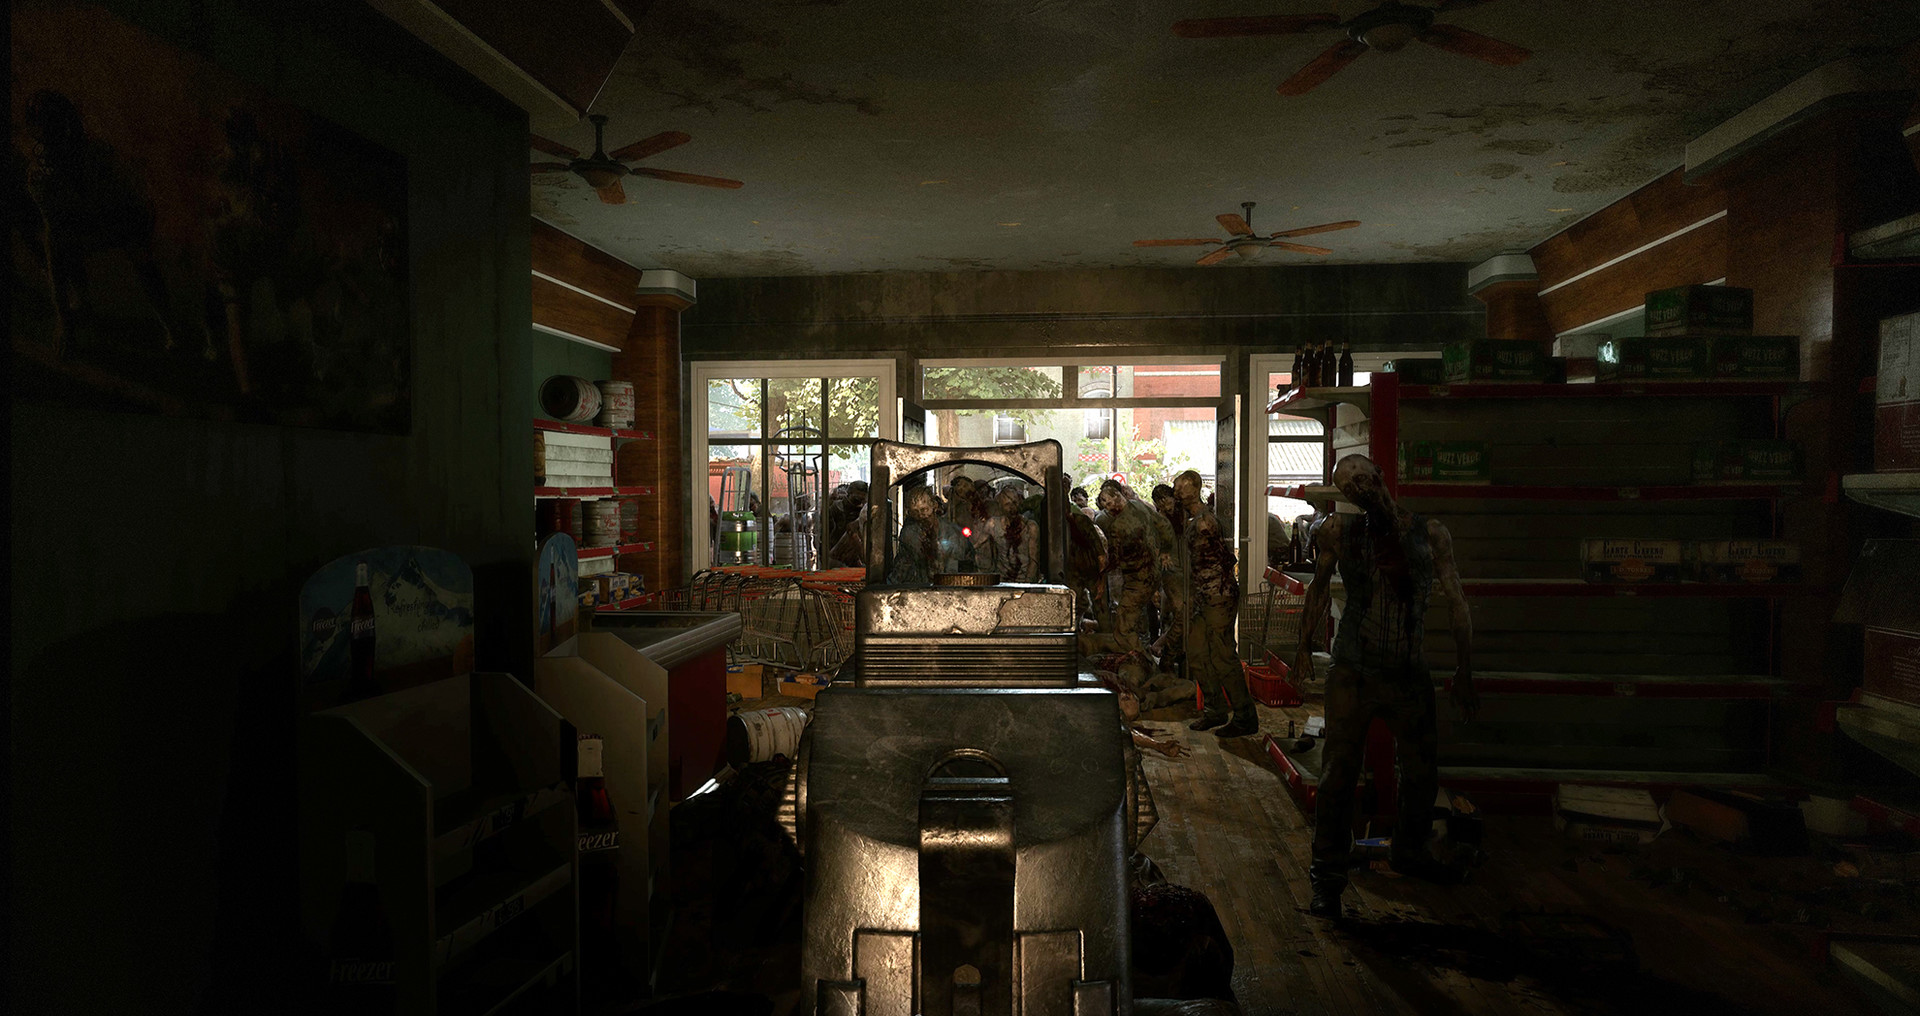 OVERKILLs The Walking Dead Update v1 0 6-CODEX – SKiDROW CODEX